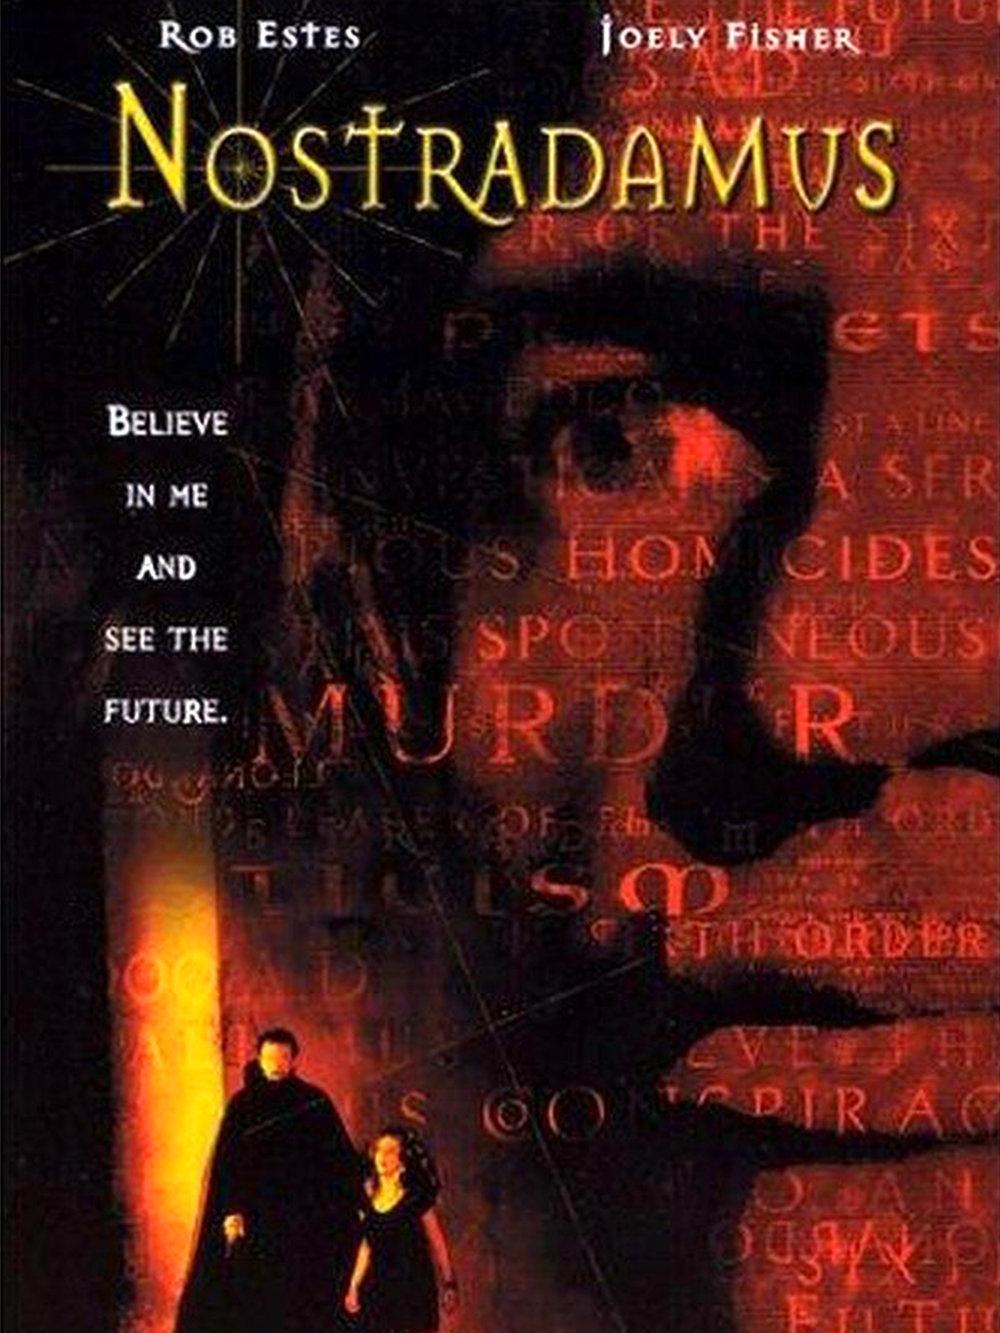 Here-Nostradamus-Full-Image-en-US.jpg